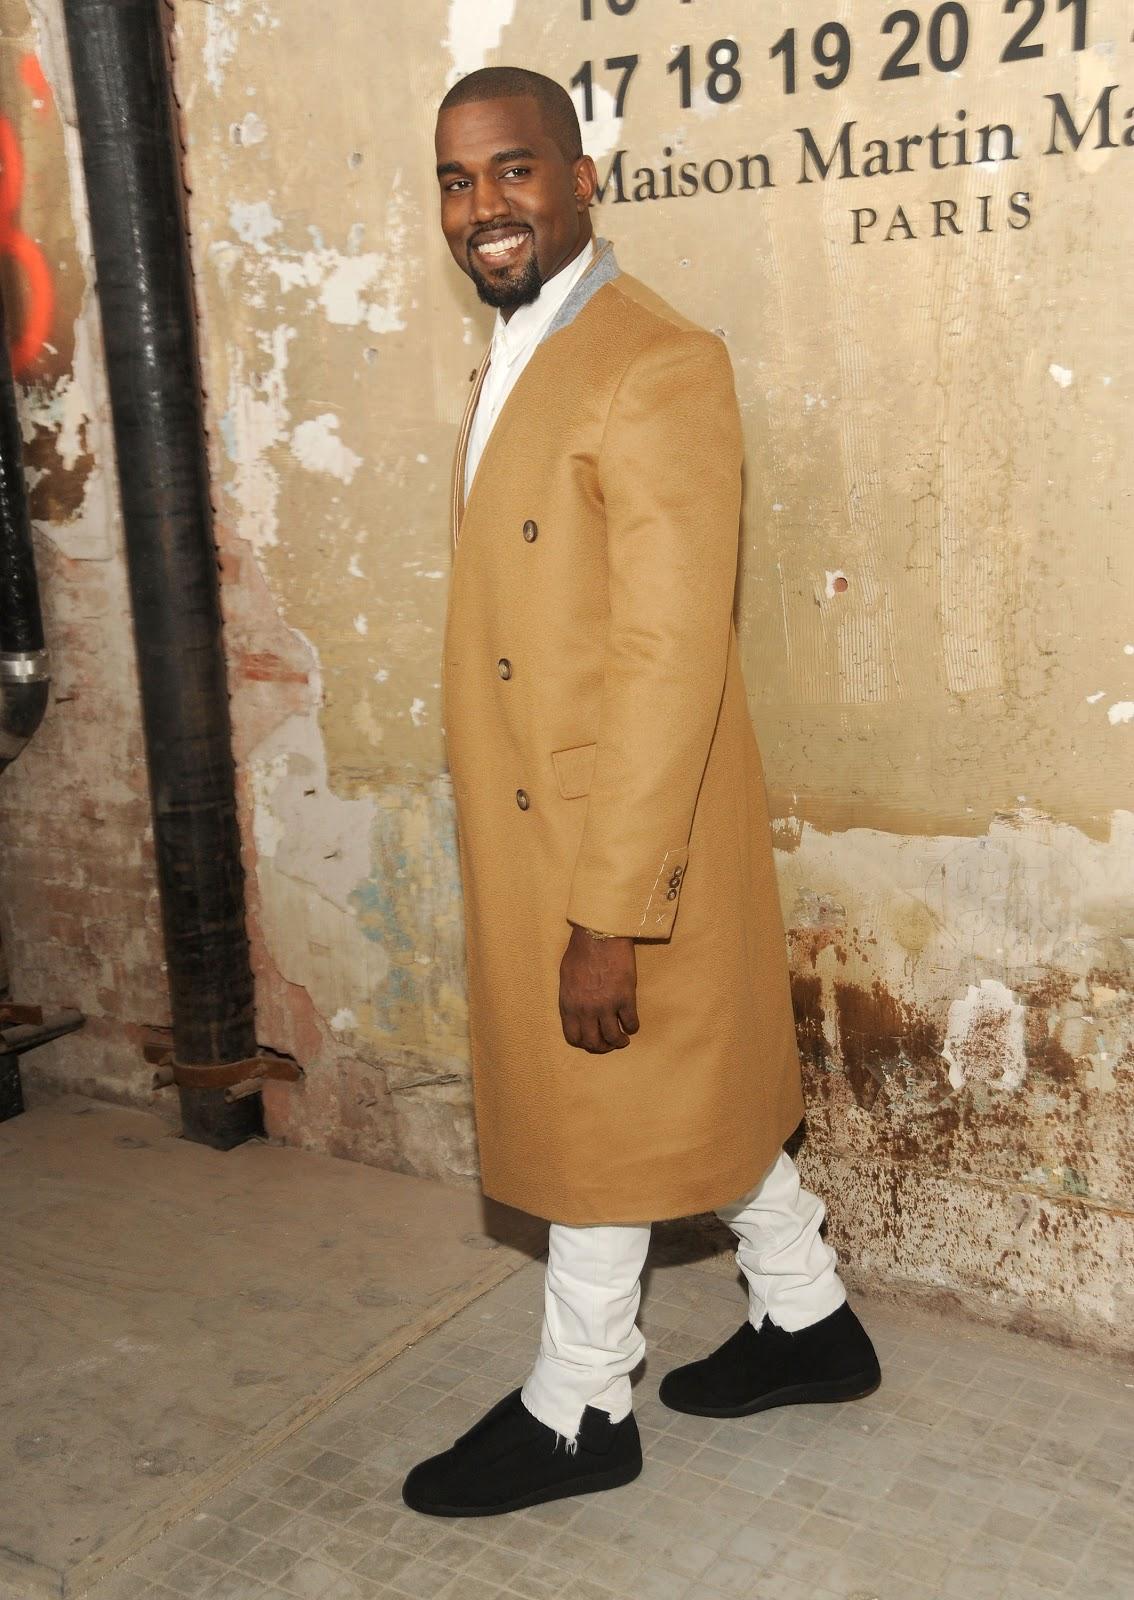 http://3.bp.blogspot.com/-RTDsoFyTDHY/UIl7u9gXJeI/AAAAAAAAI6Y/j9wbbX-Acow/s1600/MMM+with+HM_Kanye+West_wearing+MMM+with+HM.JPG